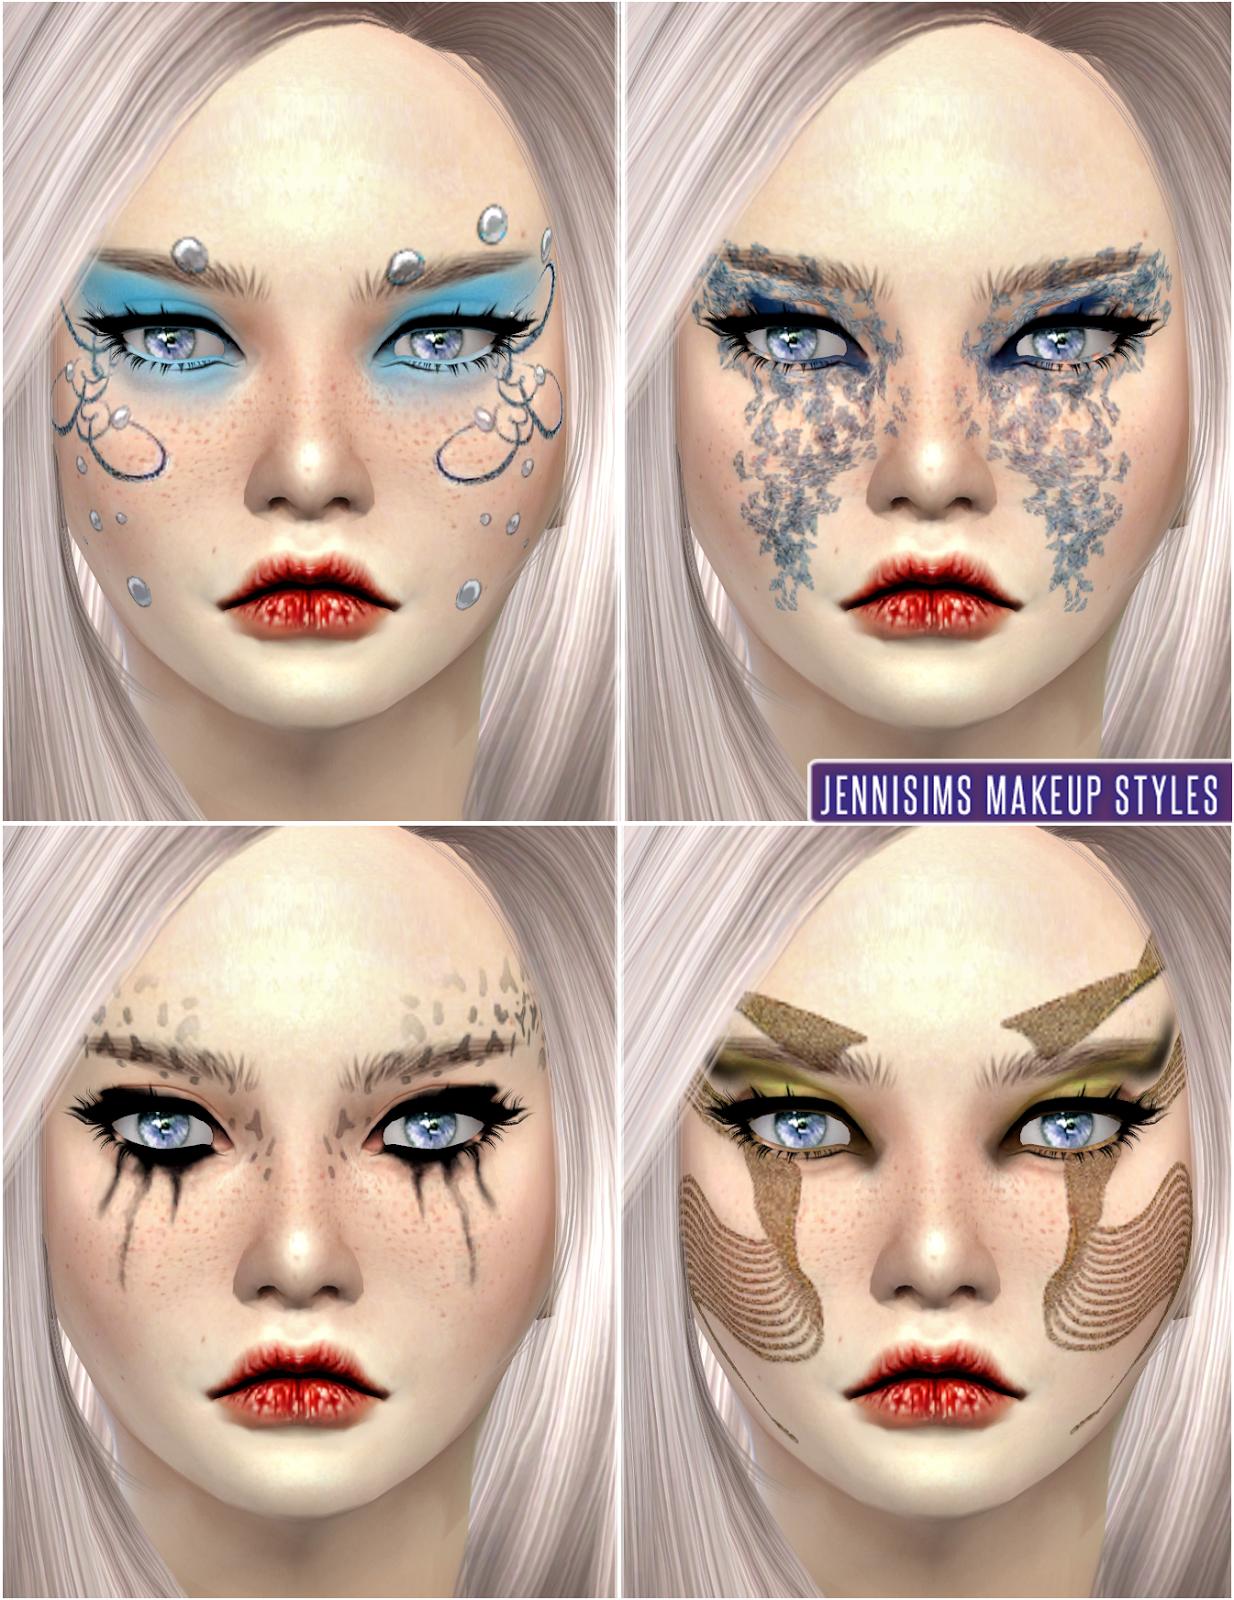 jennisims downloads sims 4 makeup so soft fantasy fairies eyeshadow